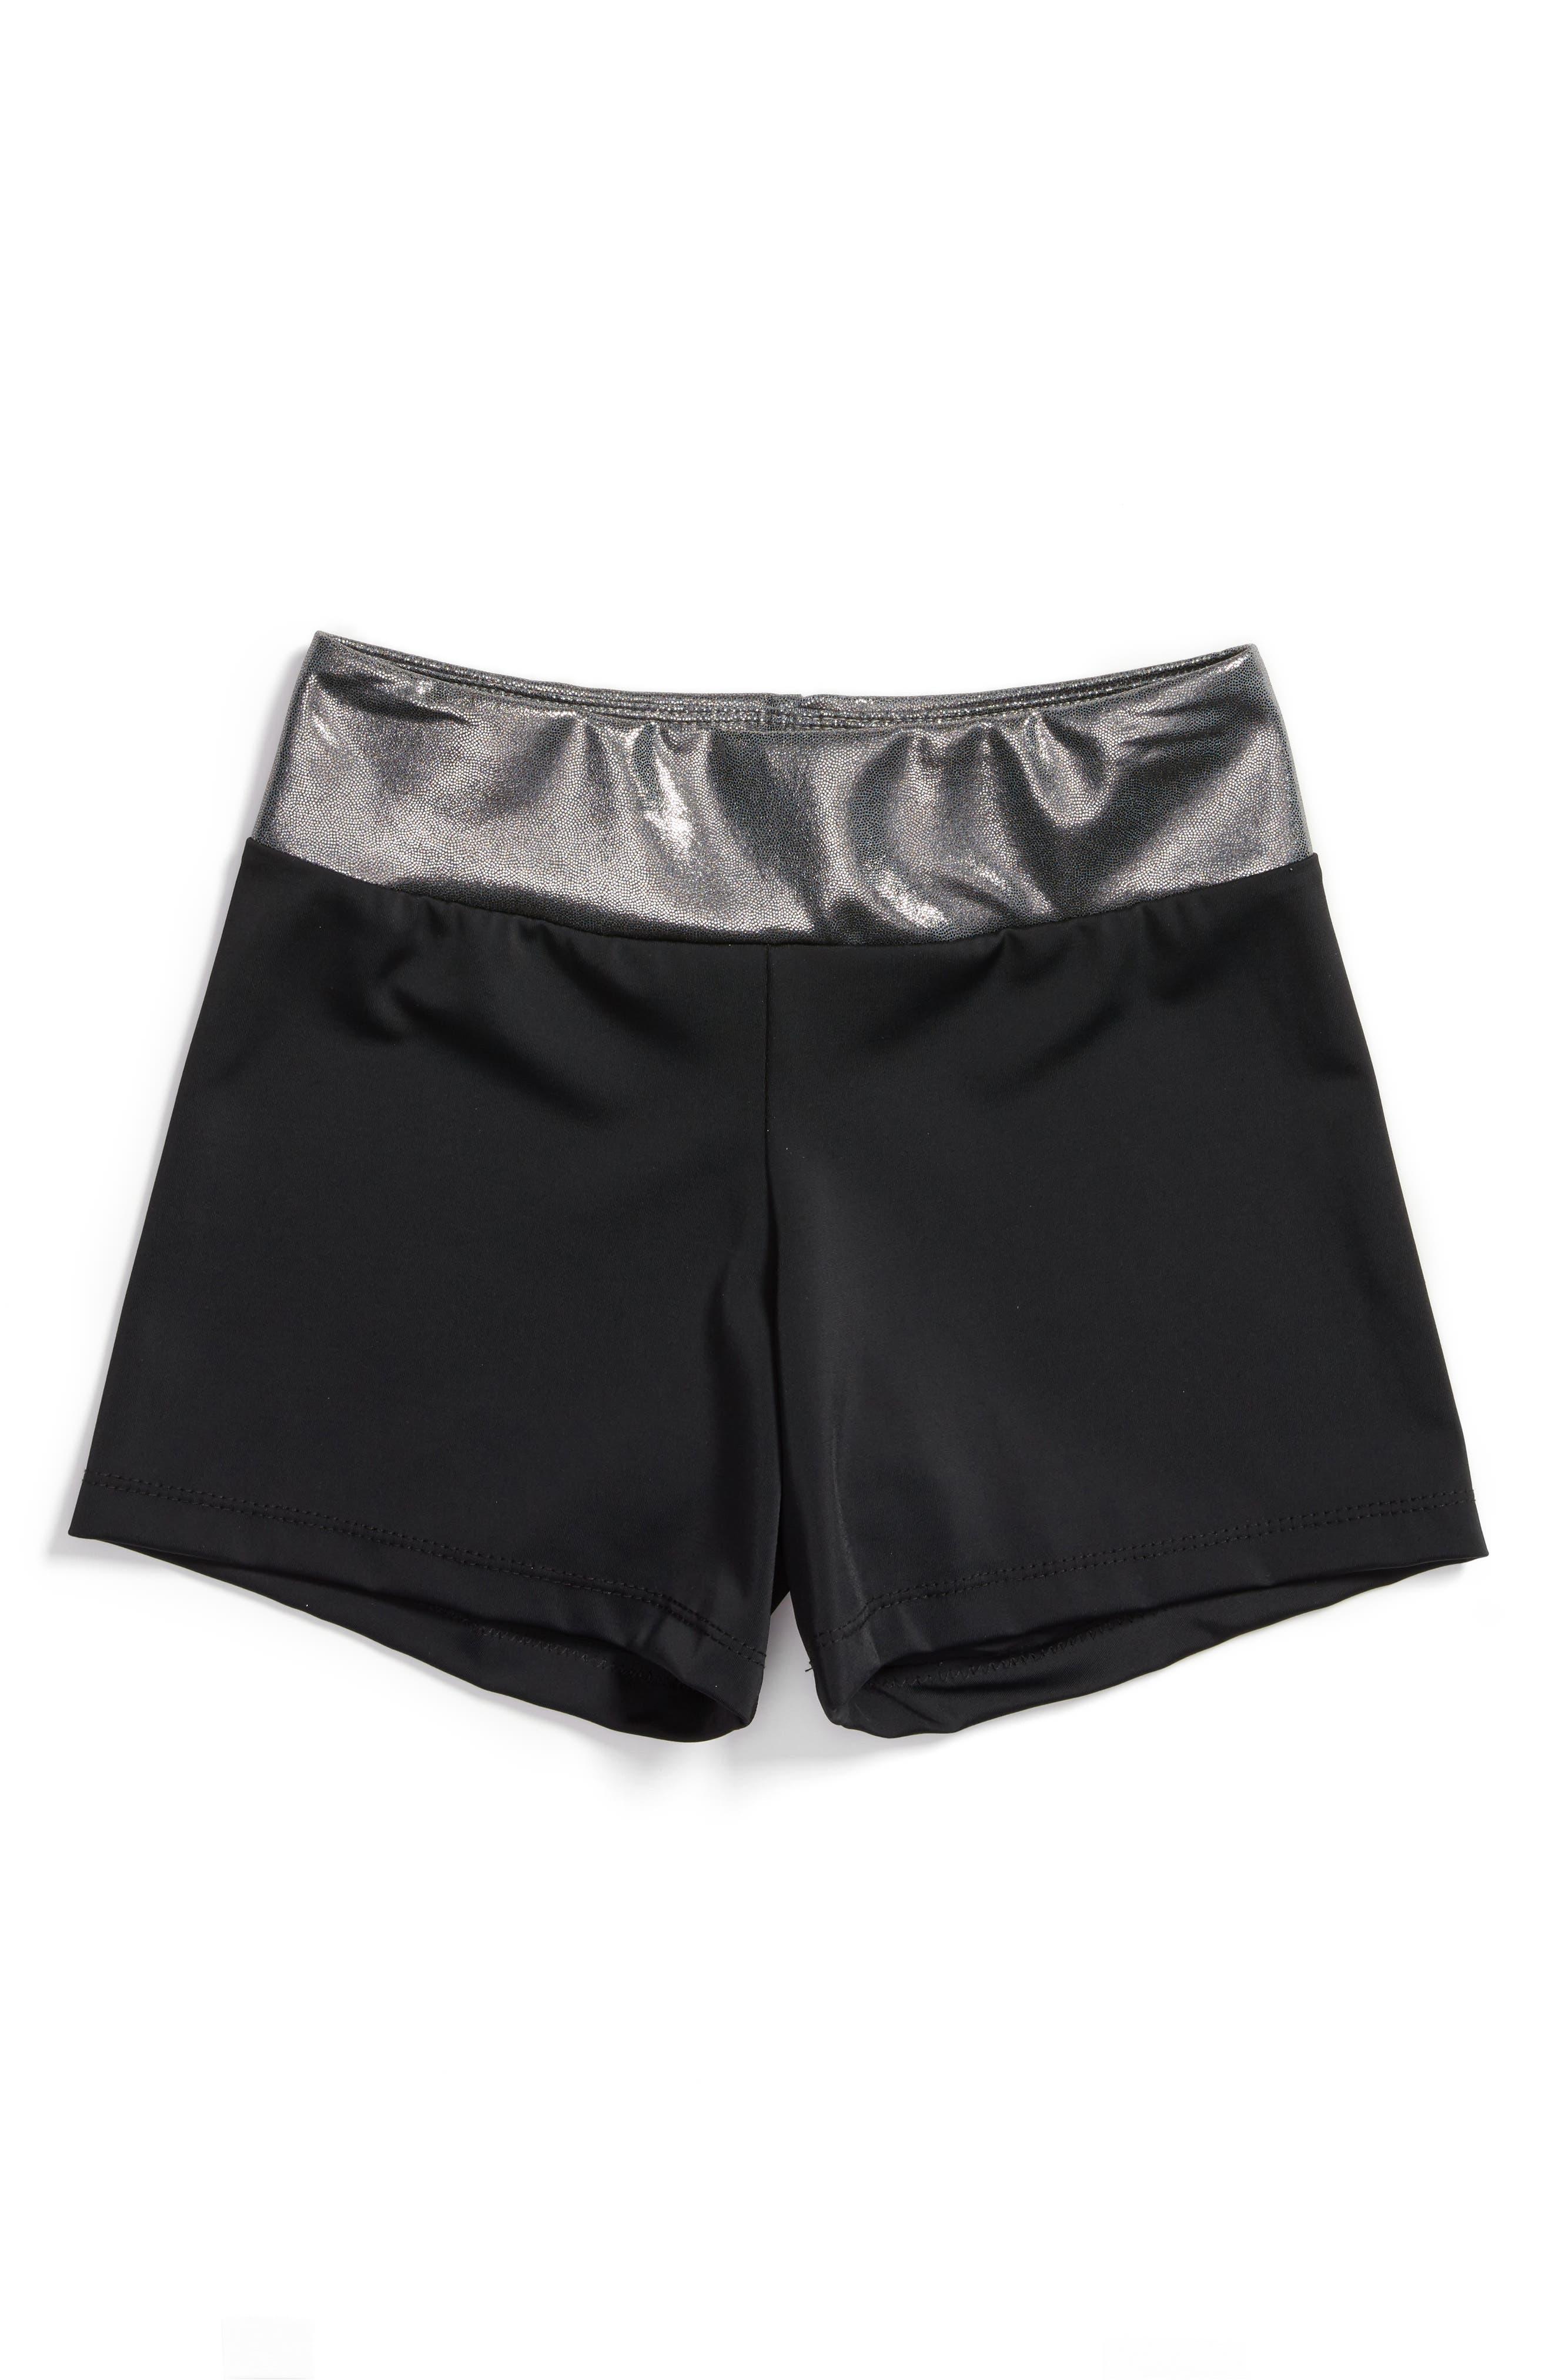 Girl Power Stretch Shorts,                             Main thumbnail 1, color,                             001